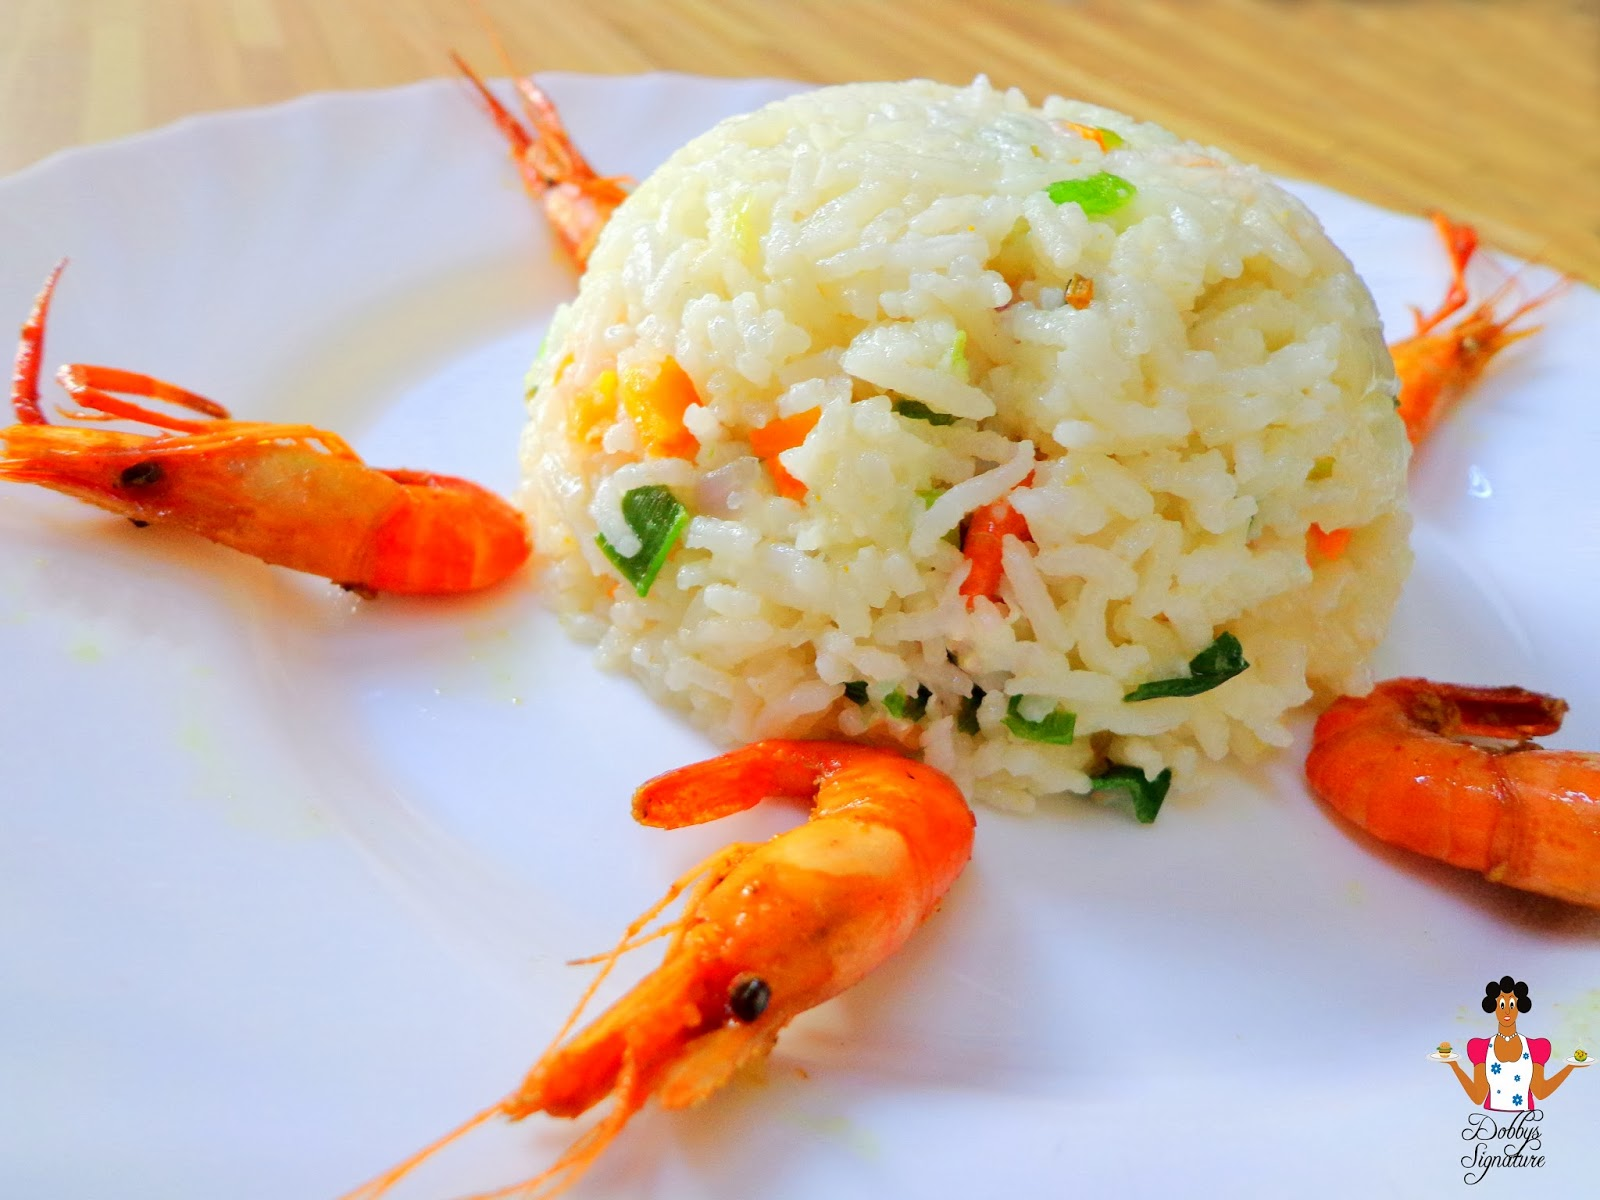 Dobbys signature nigerian food blog i nigerian food recipes i basmati seafood fried rice ccuart Choice Image